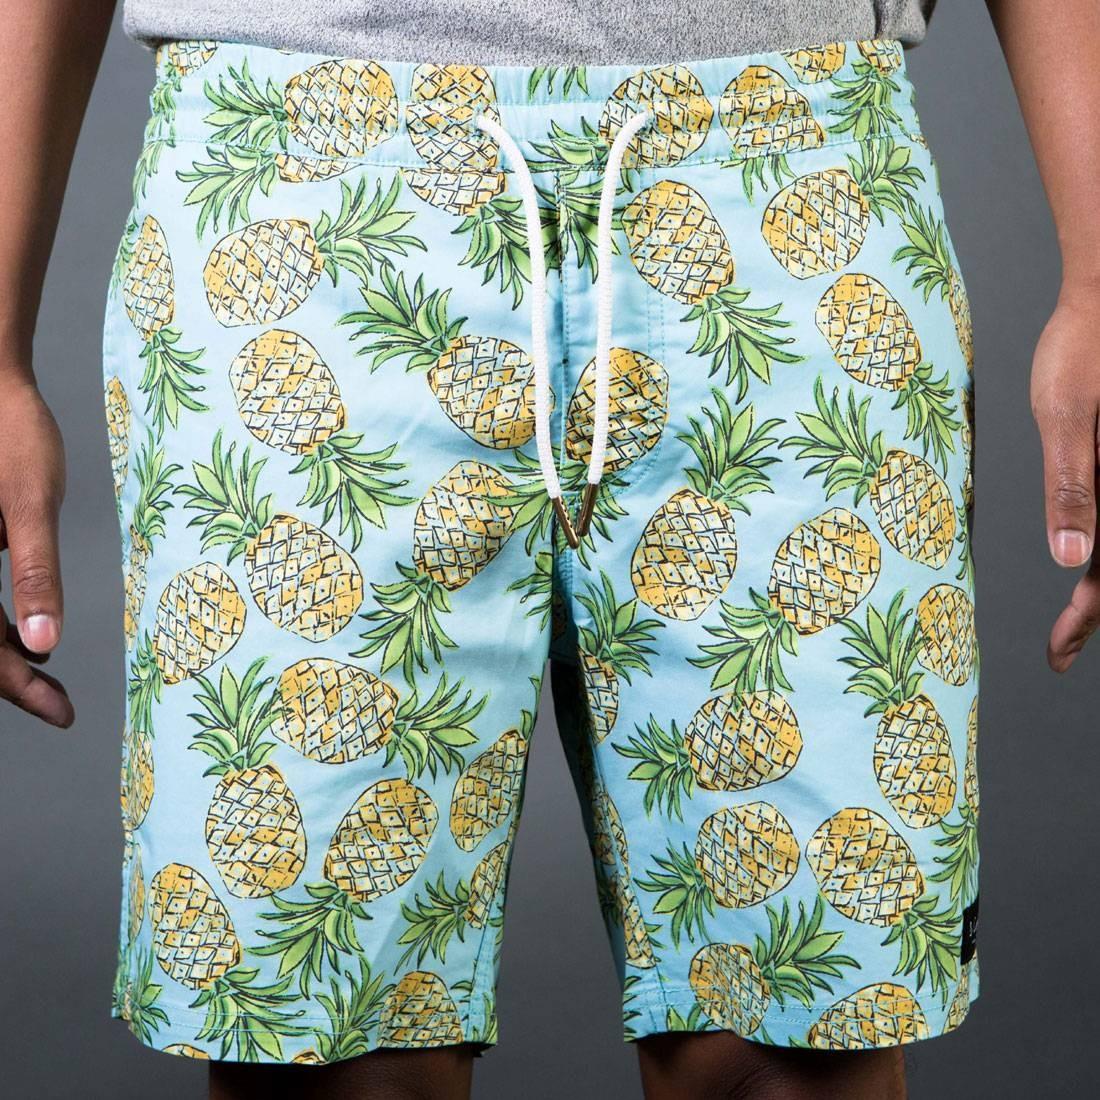 Barney Cools Men Amphibious Shorts (blue / green / pineapple)